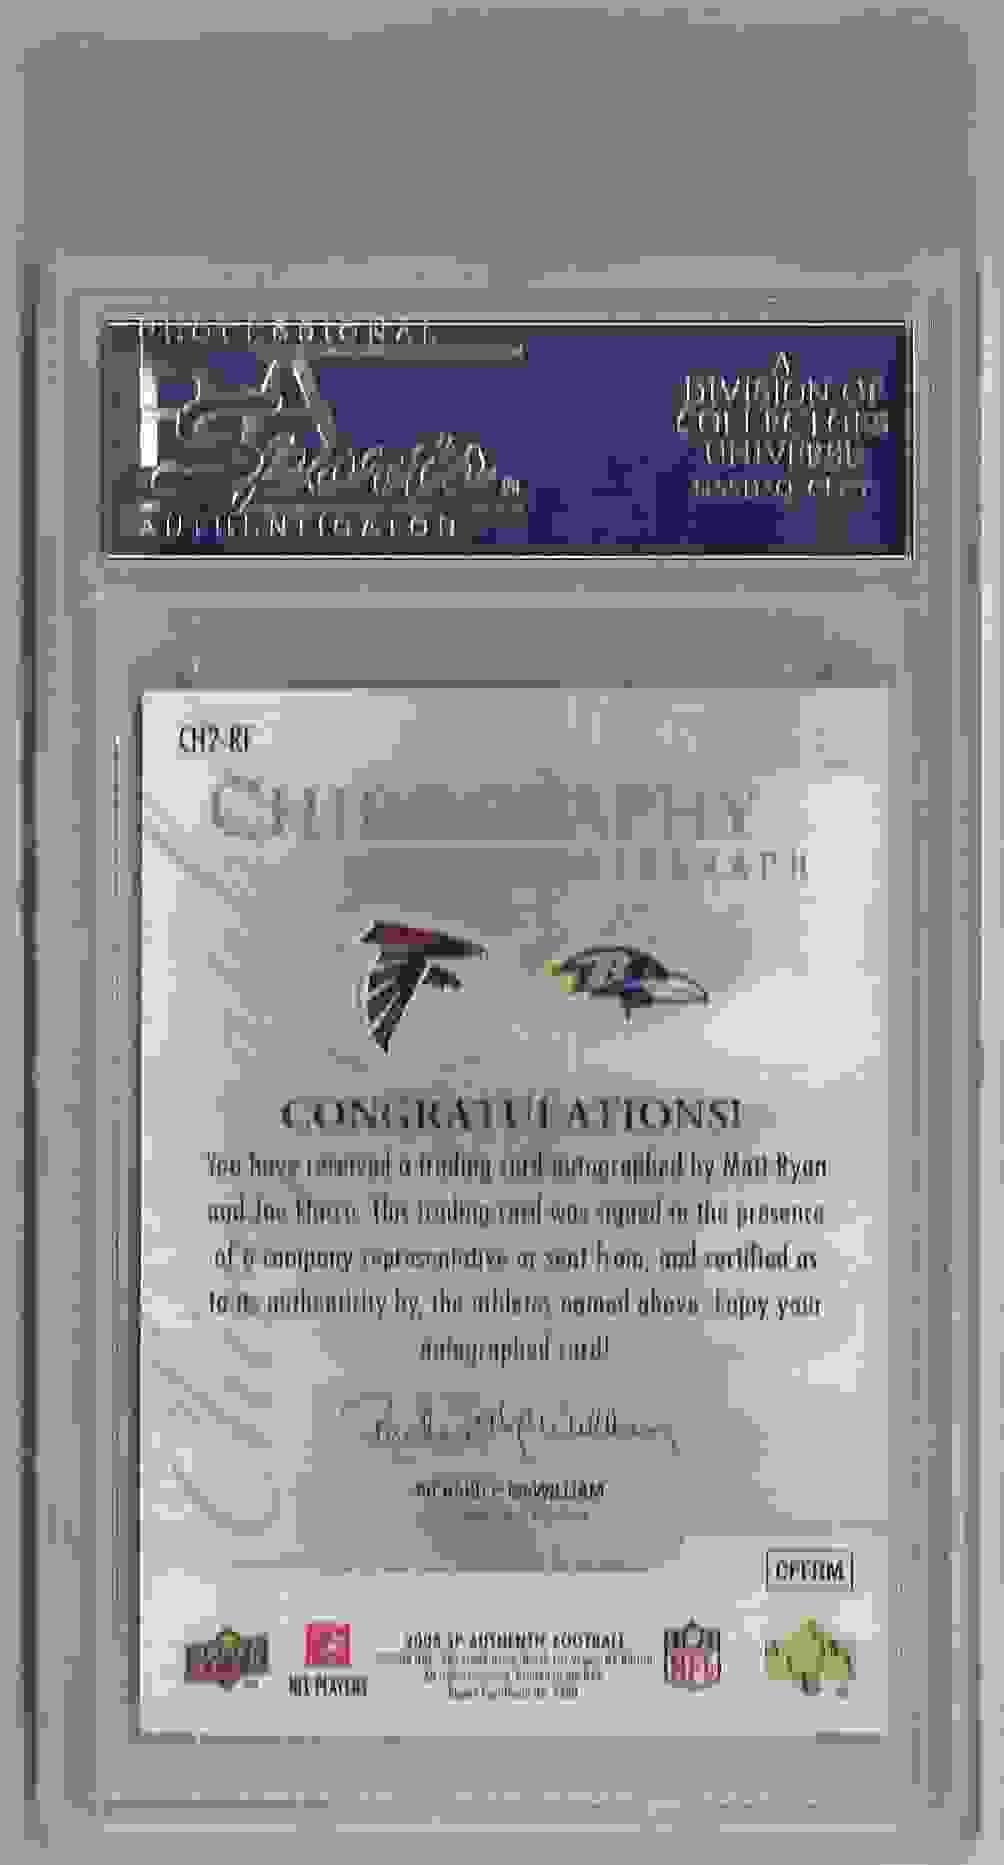 2008 SP Authentic Chirography Dual Matt Ryan/Joe Flacco #CH2-RF card back image